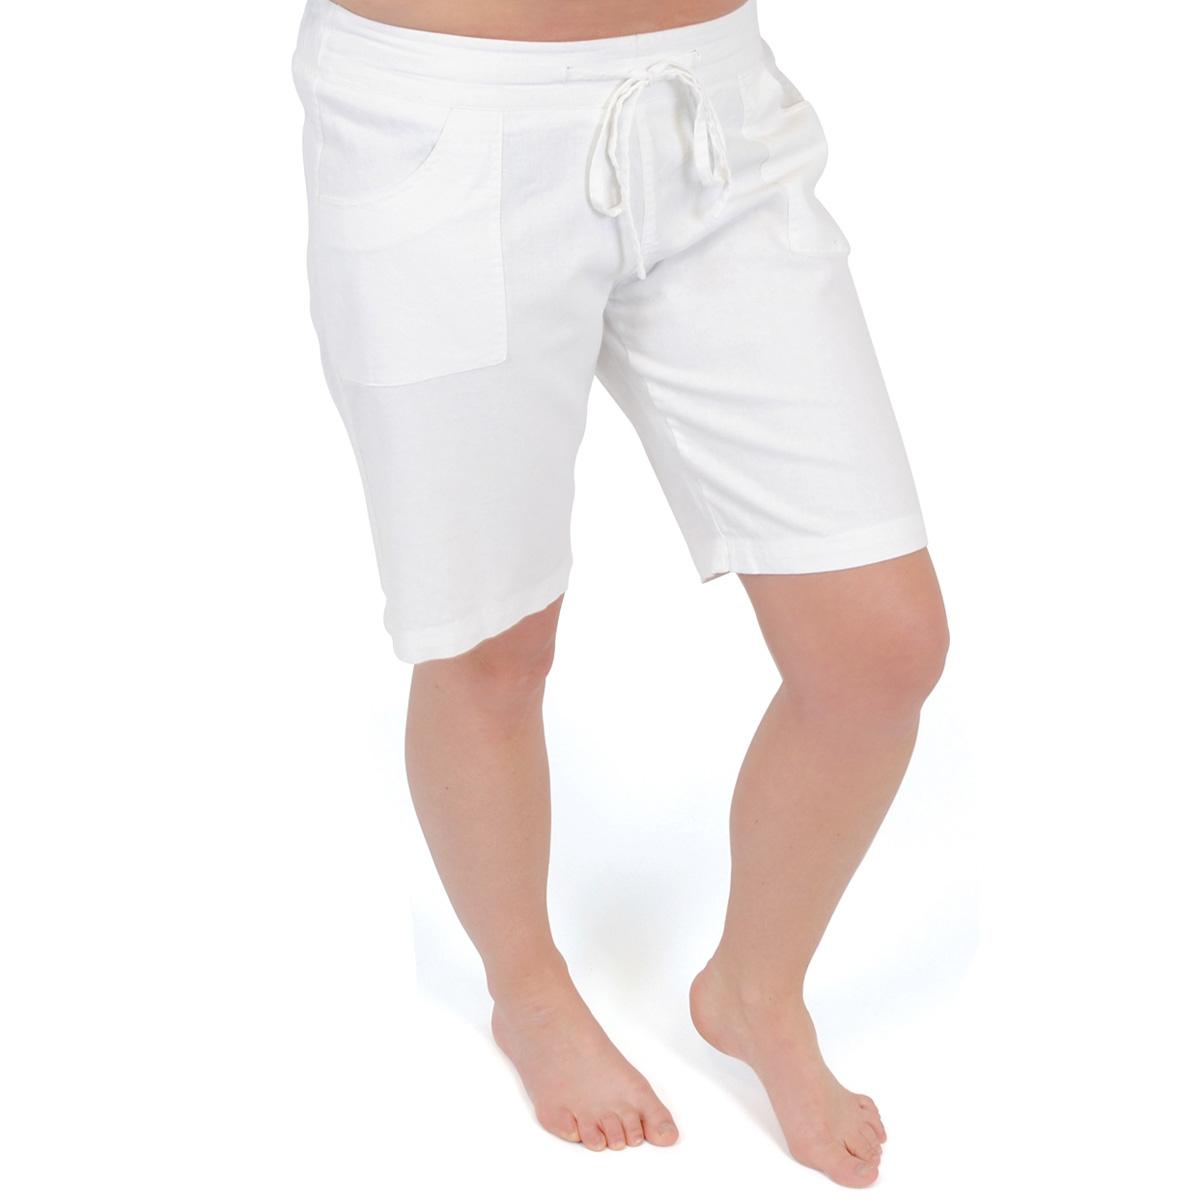 Womens Linen Shorts 3/4 Length Trousers Shorts Ladies ...